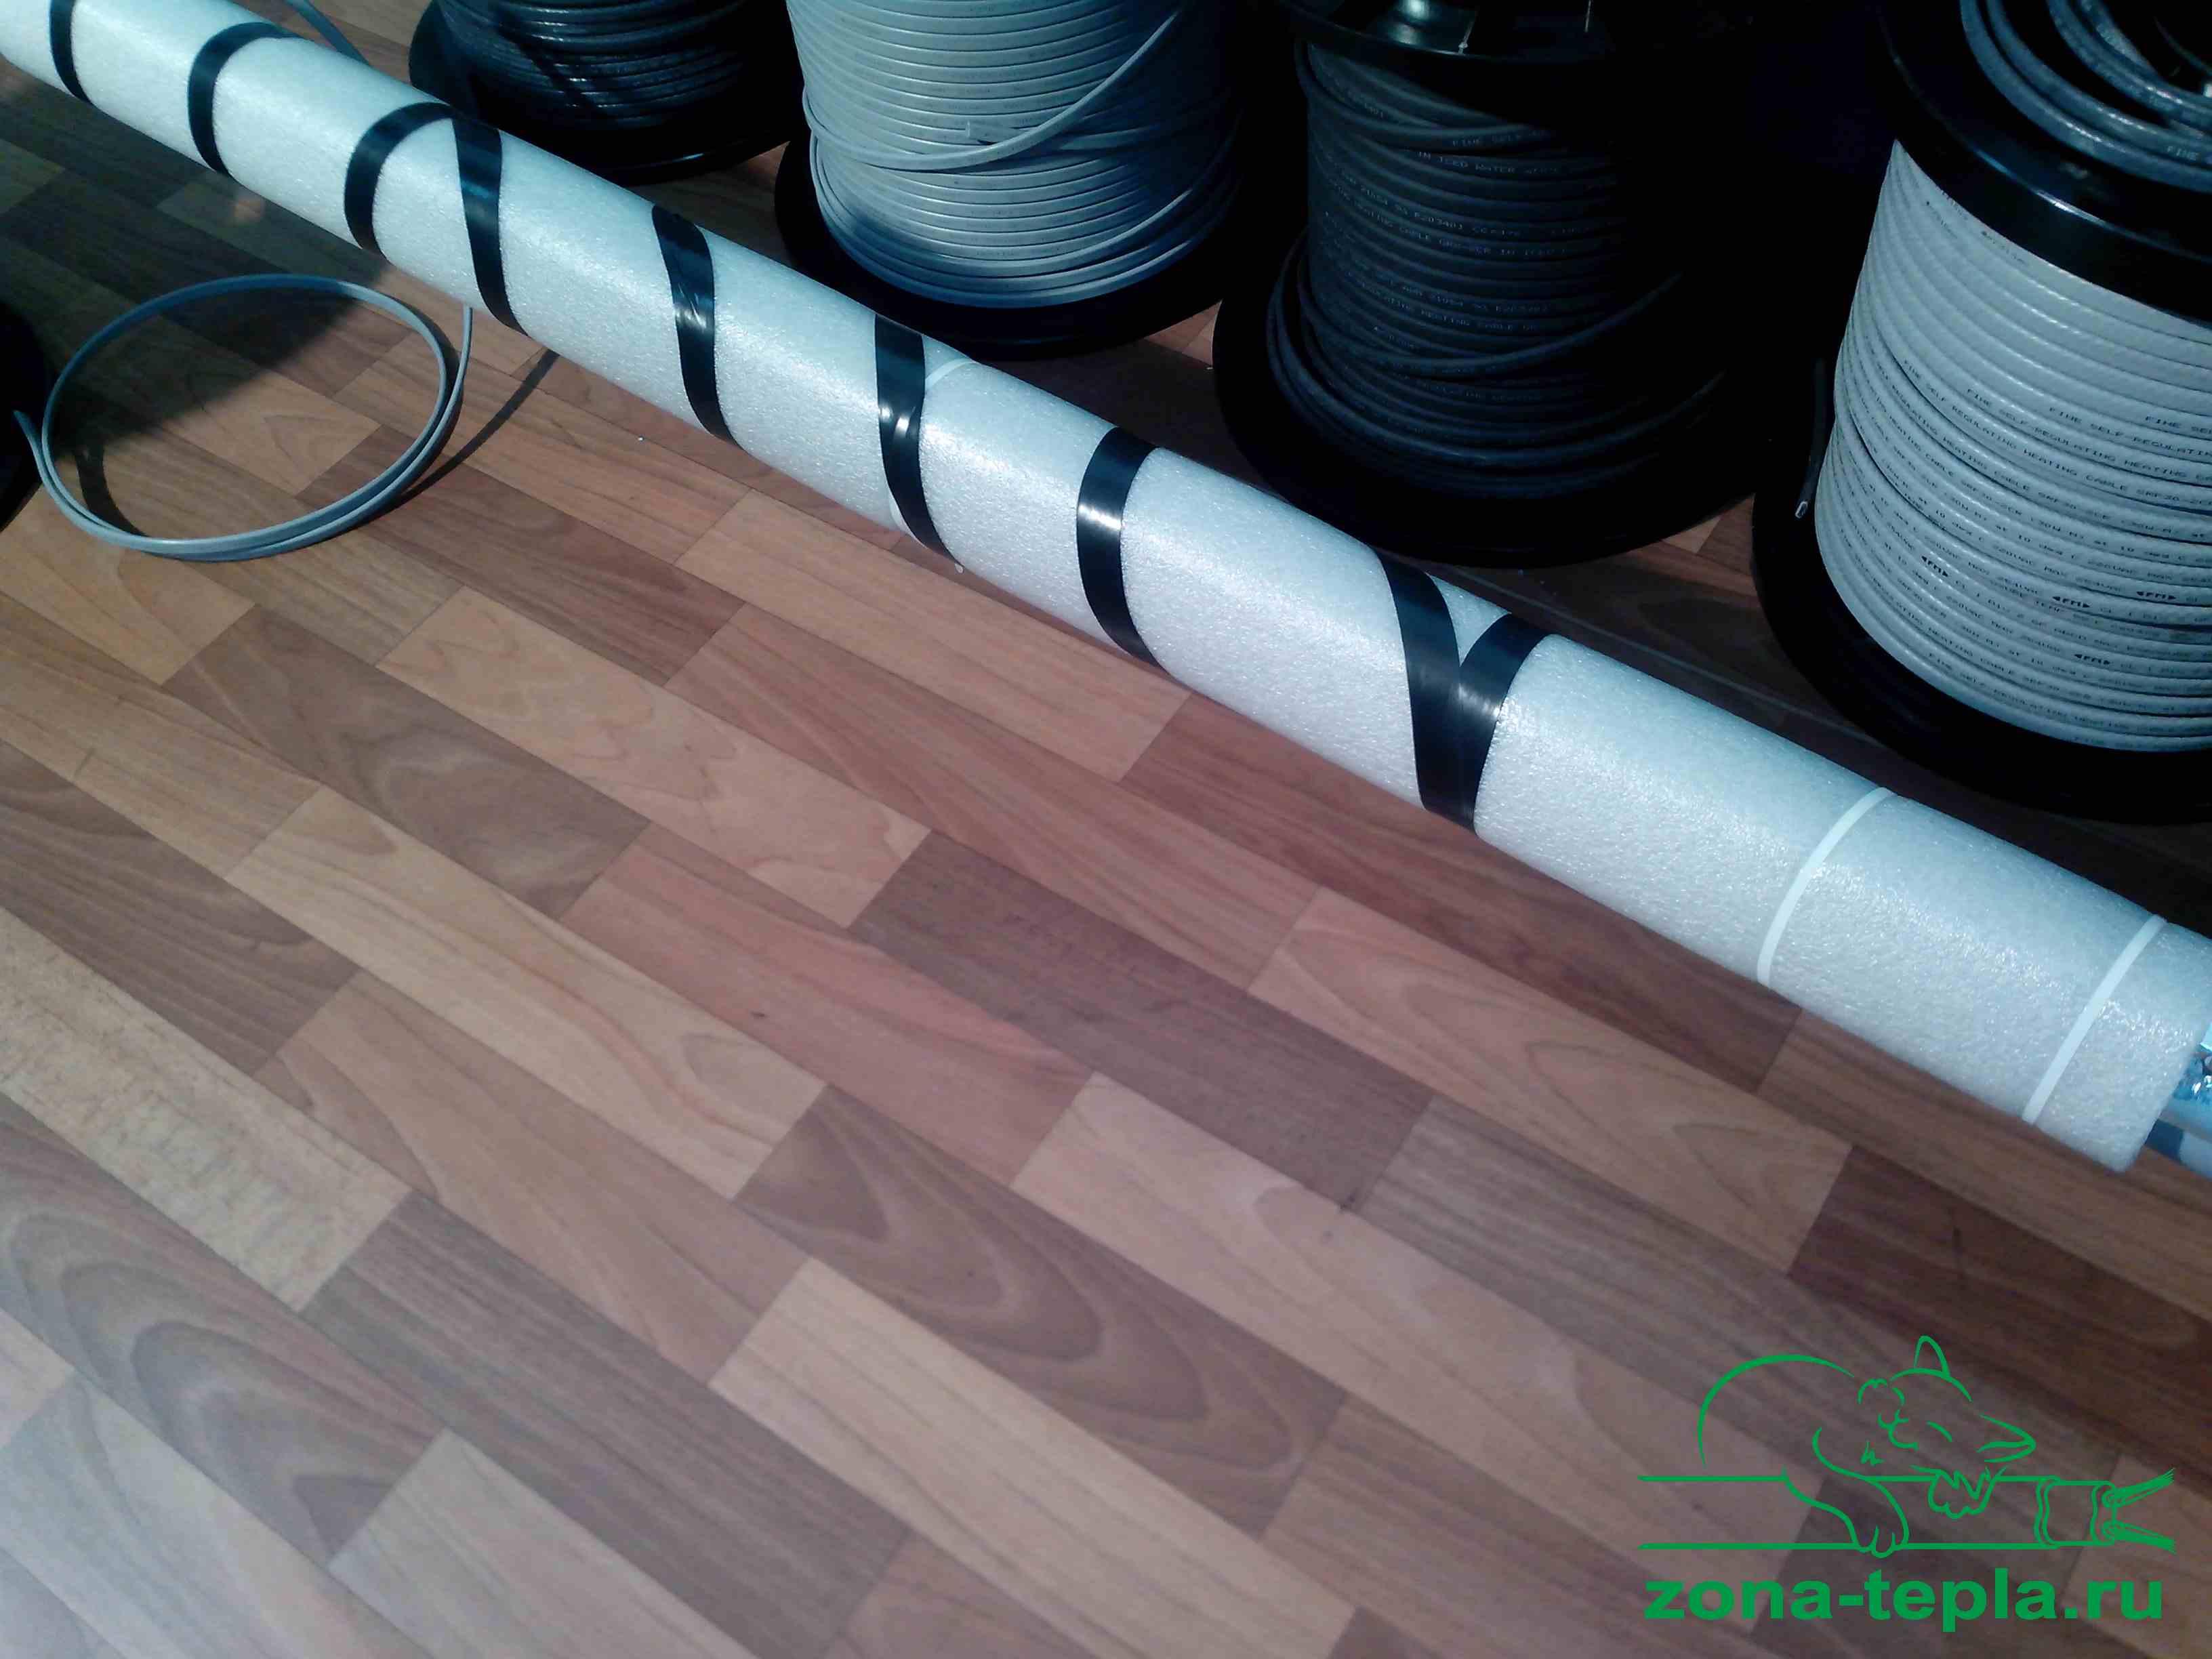 Теплоизоляции комплектующие стен для